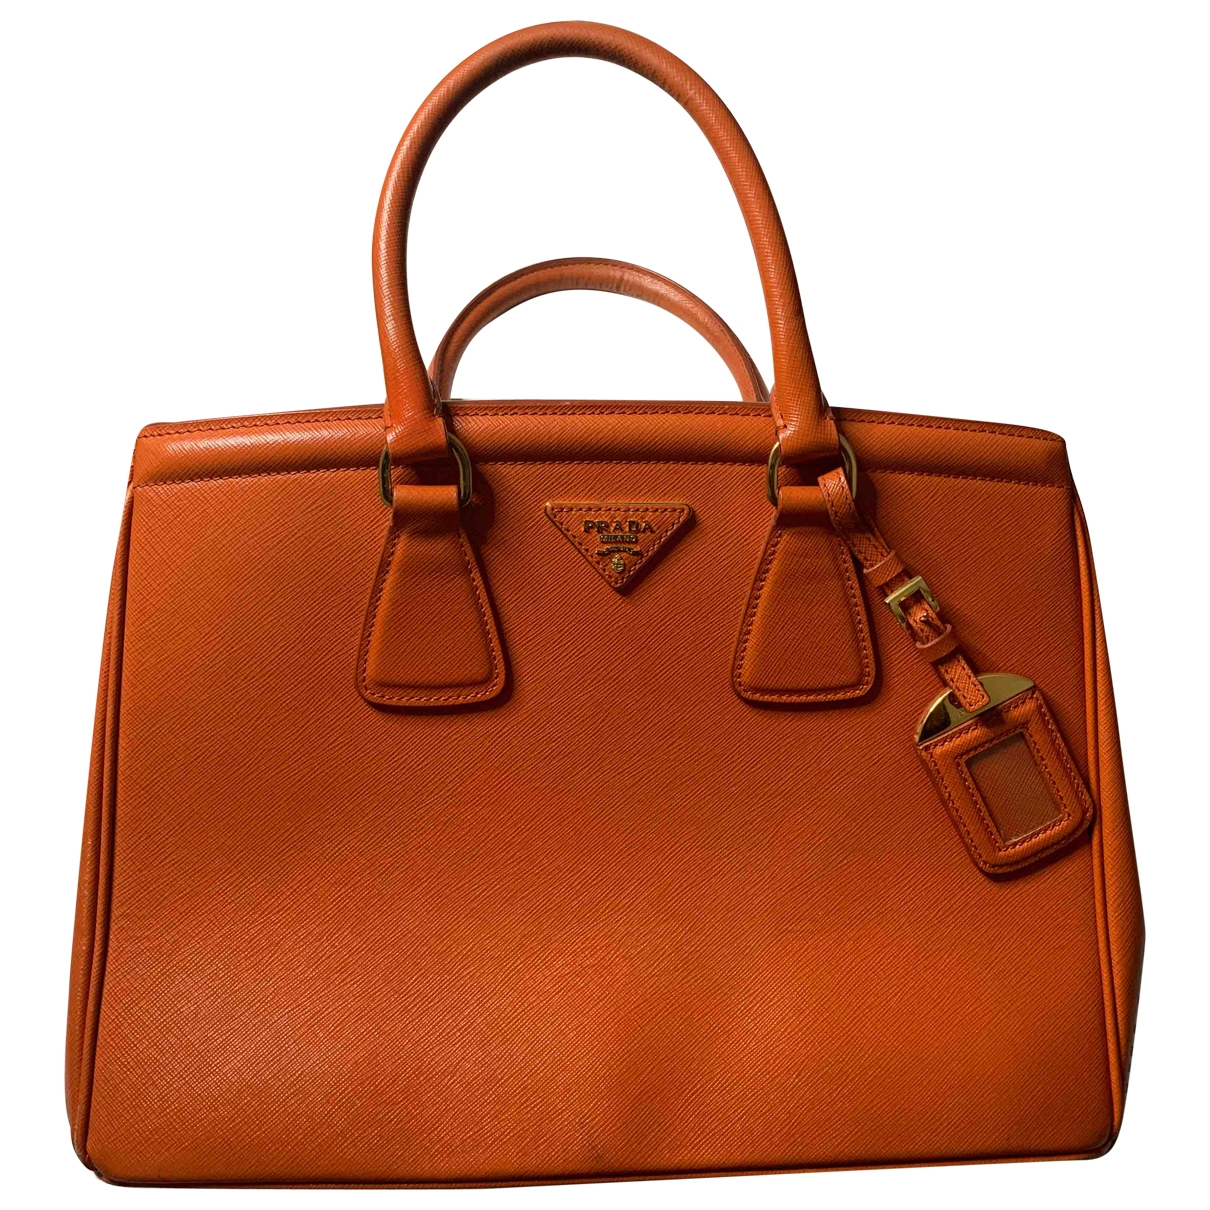 Prada saffiano  Handtasche in  Orange Leder